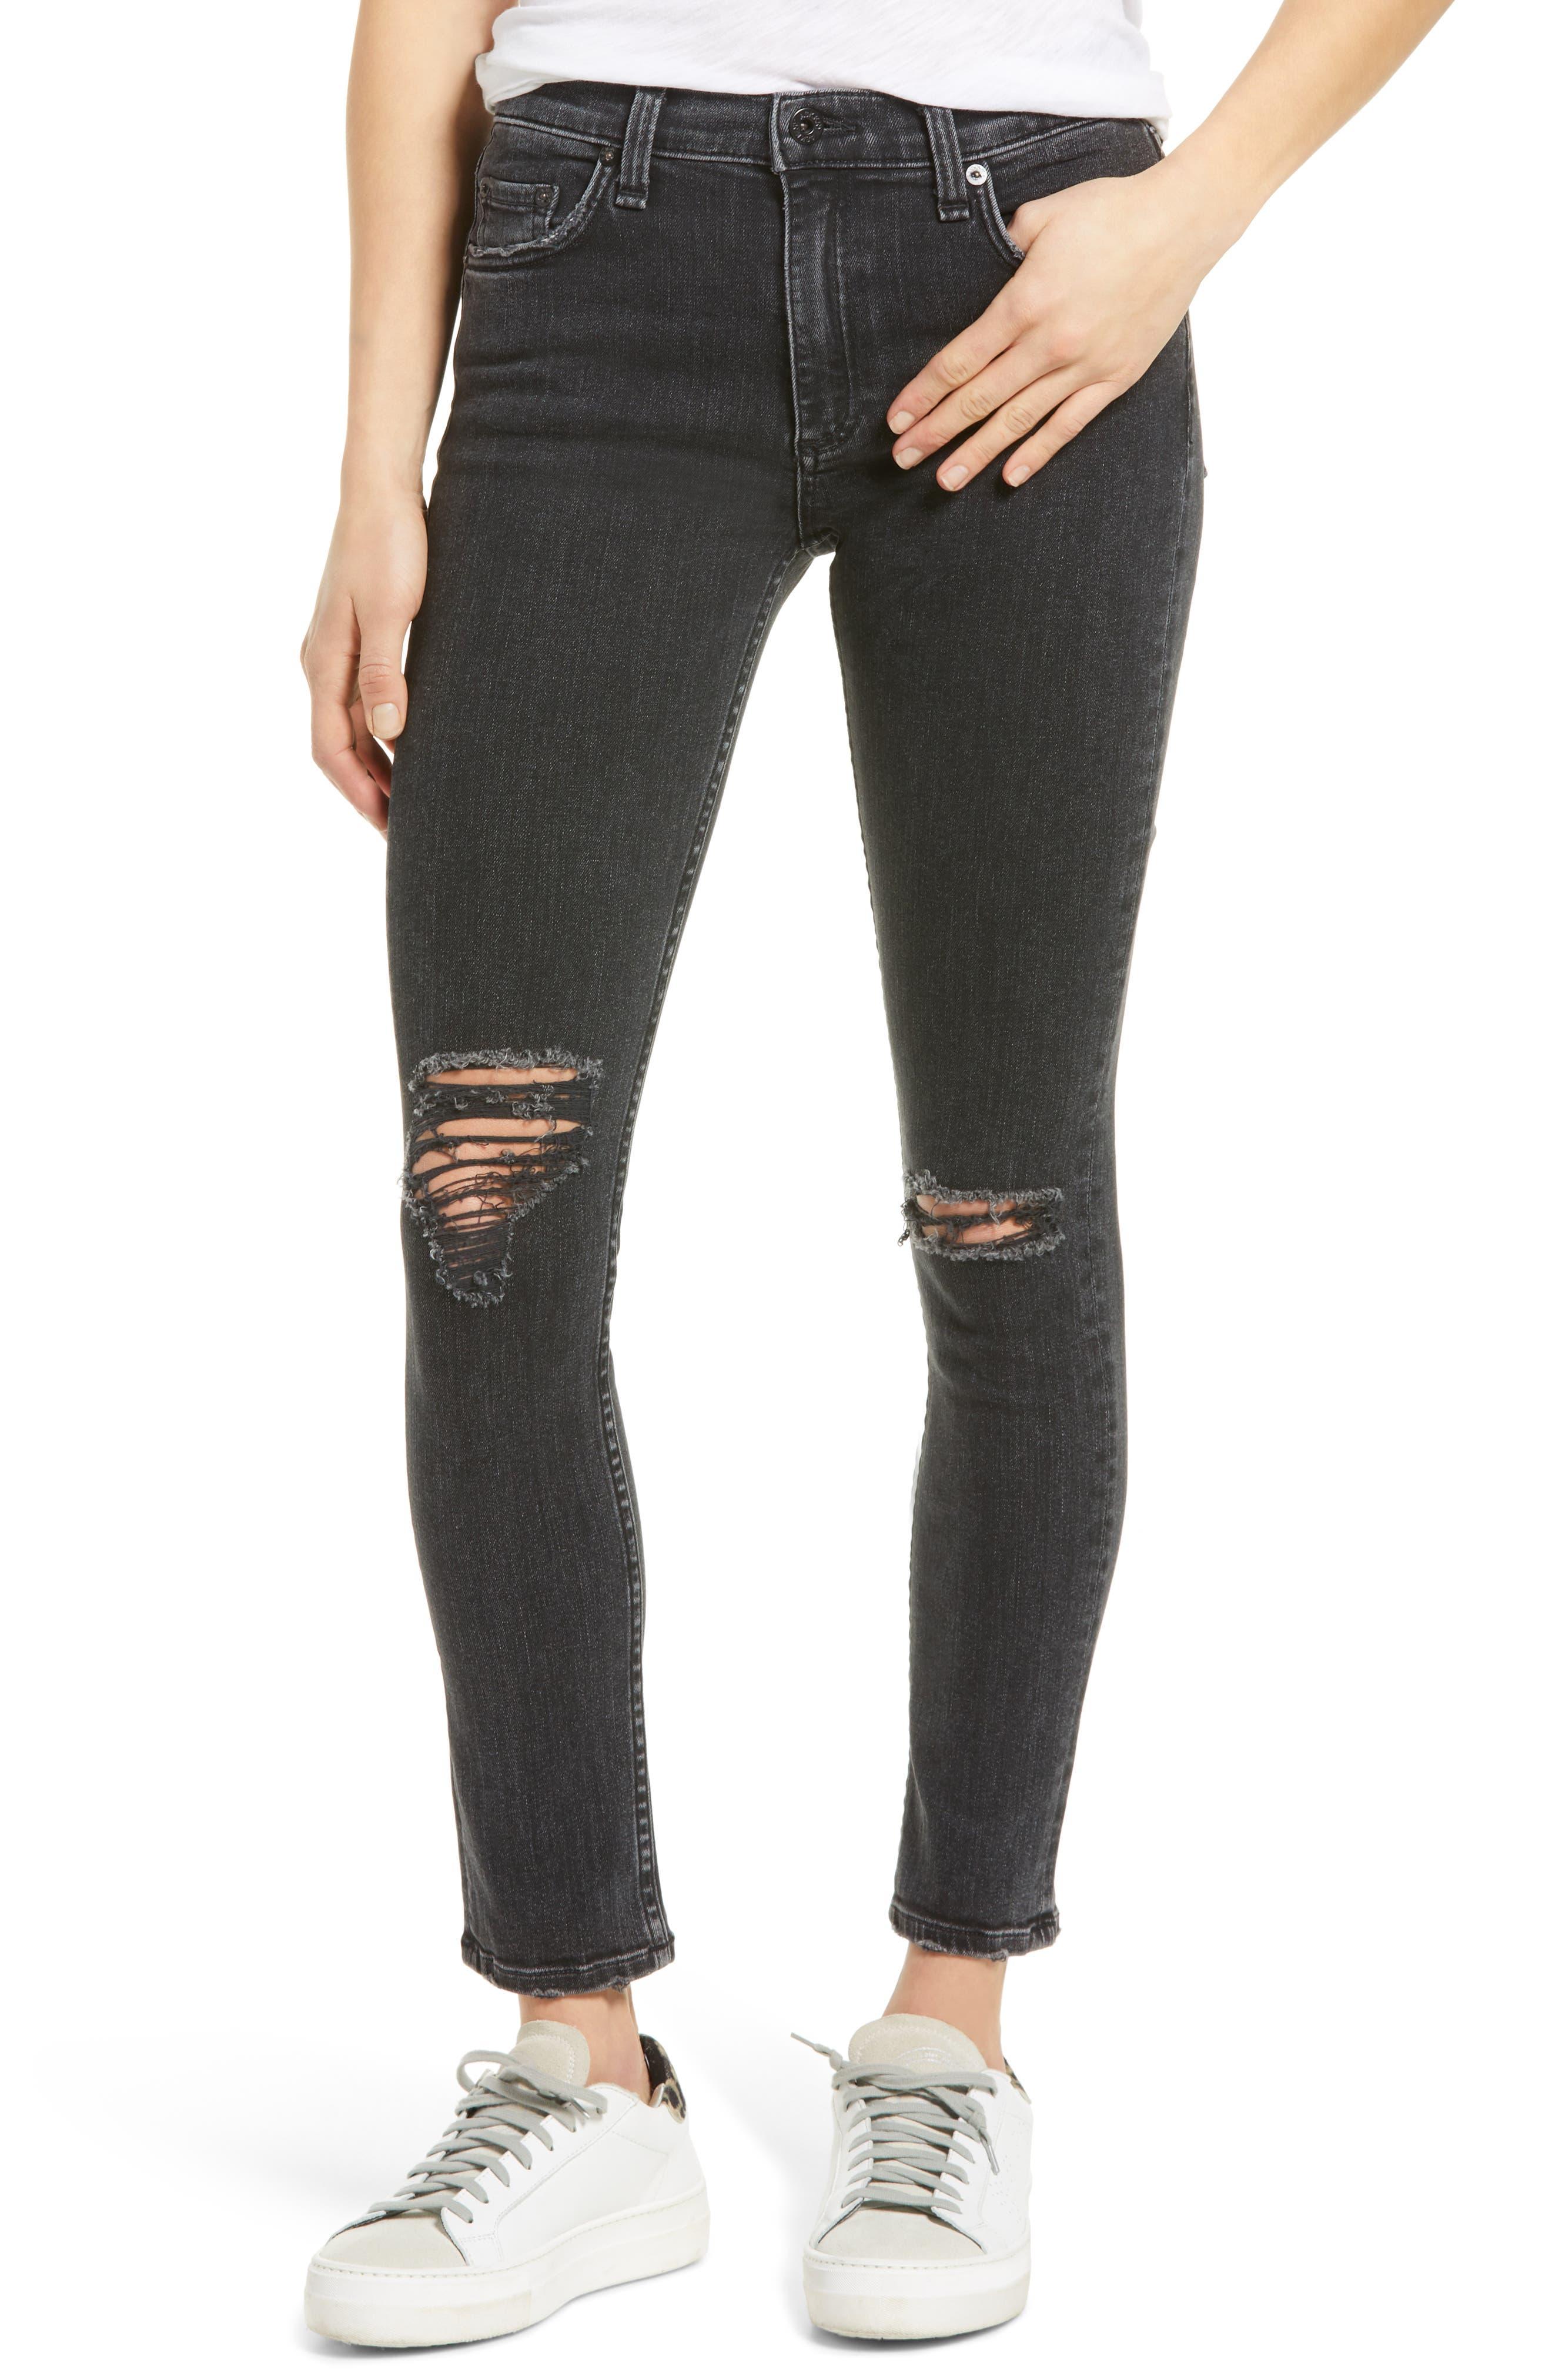 Jax High Waist Ripped Ankle Skinny Jeans